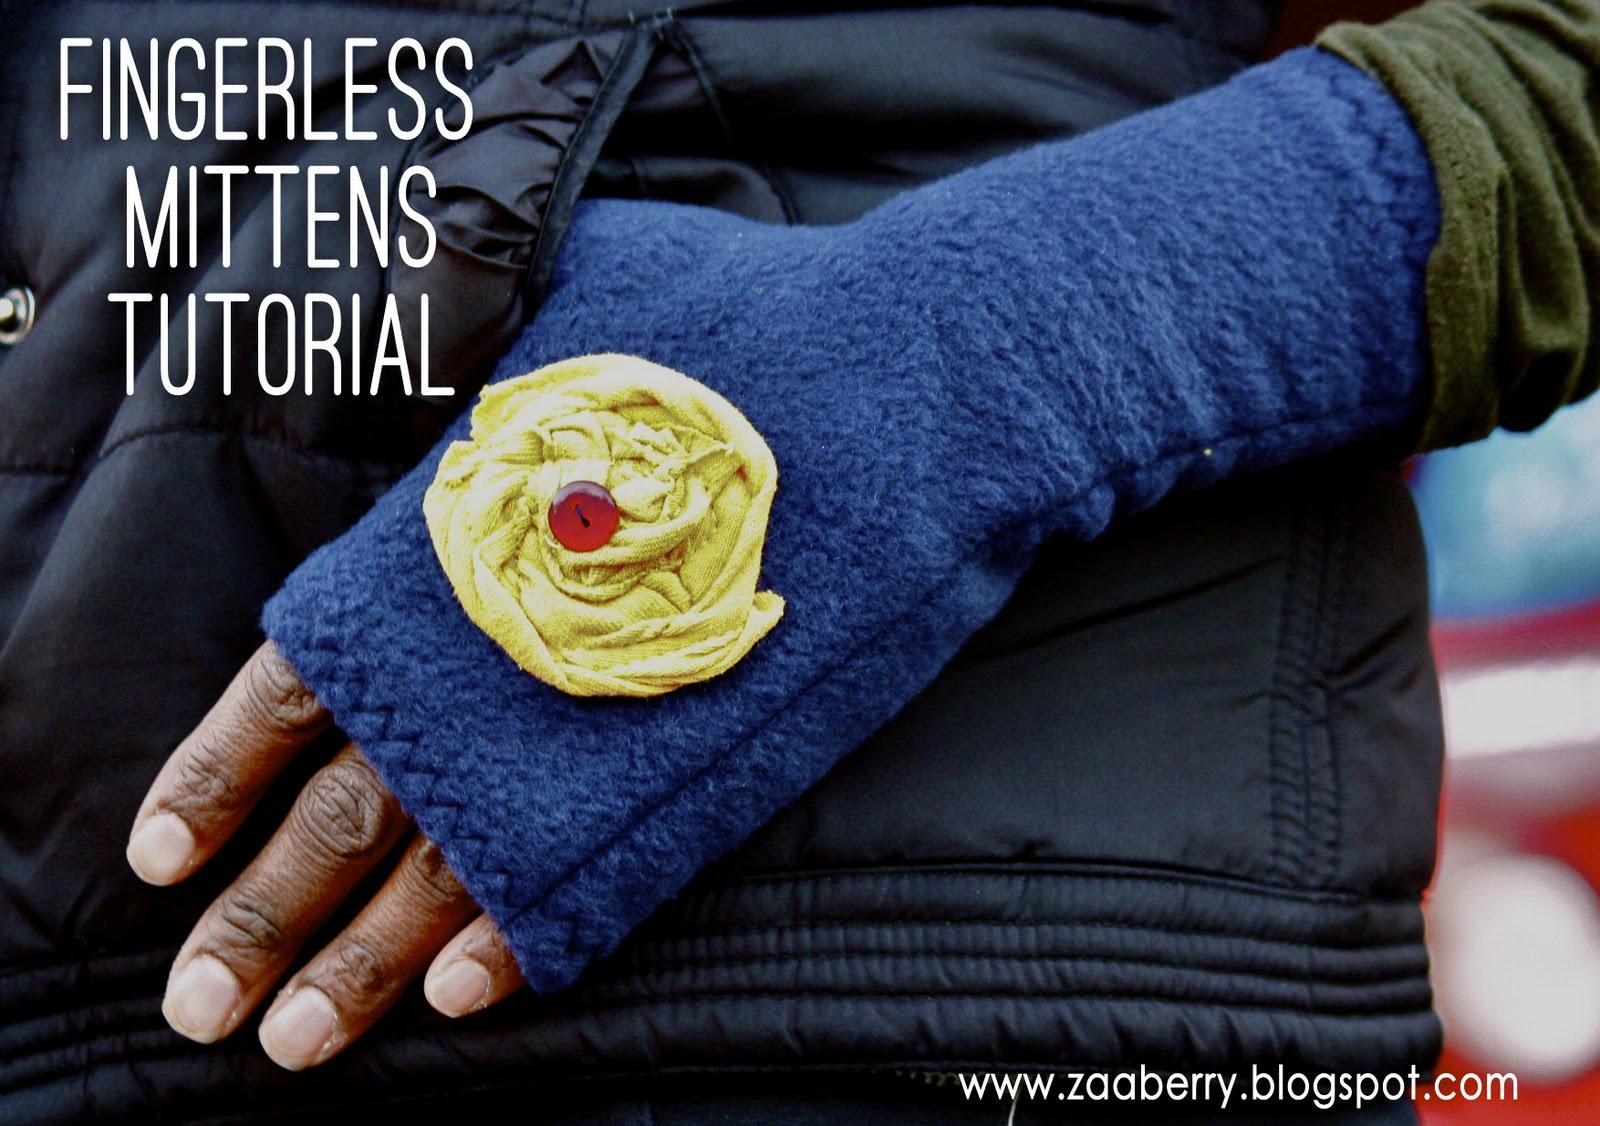 Zaaberry fingerless mittens tutorial 11092011 jeuxipadfo Image collections